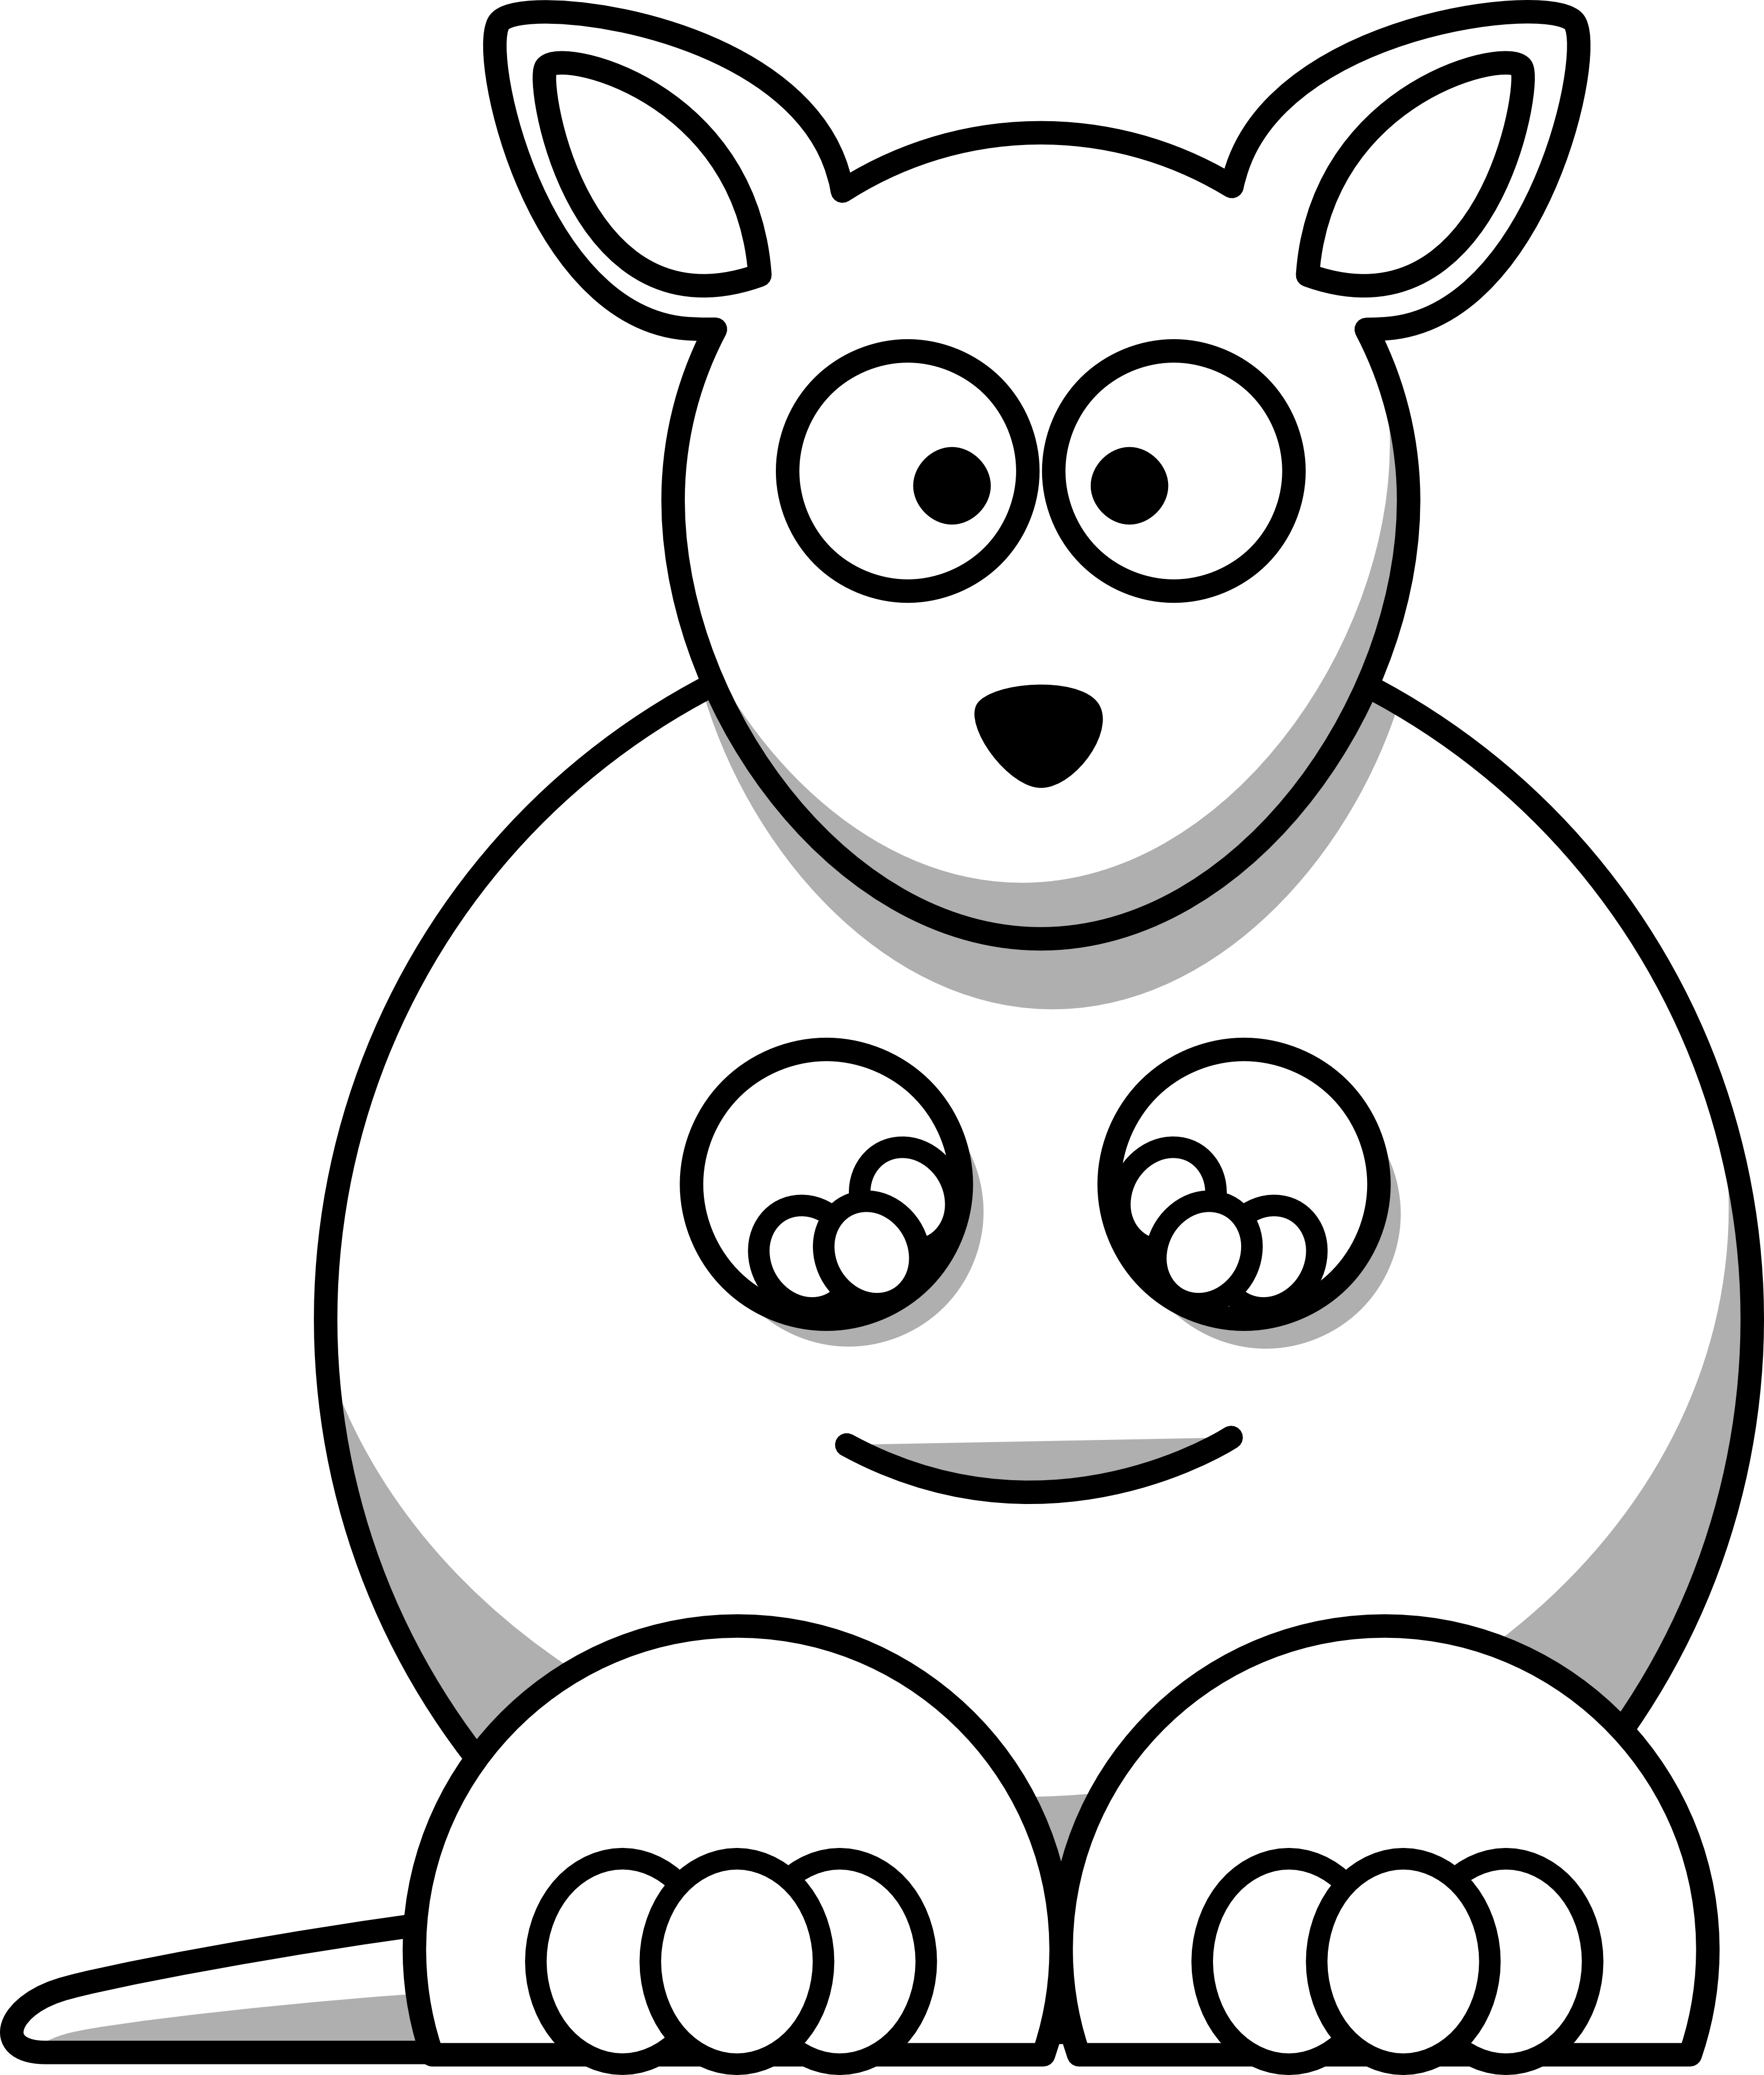 Black and white sun cross clipart clip art black and white library ➡➡ Kangaroo Clip Art Black And White Free Download clip art black and white library